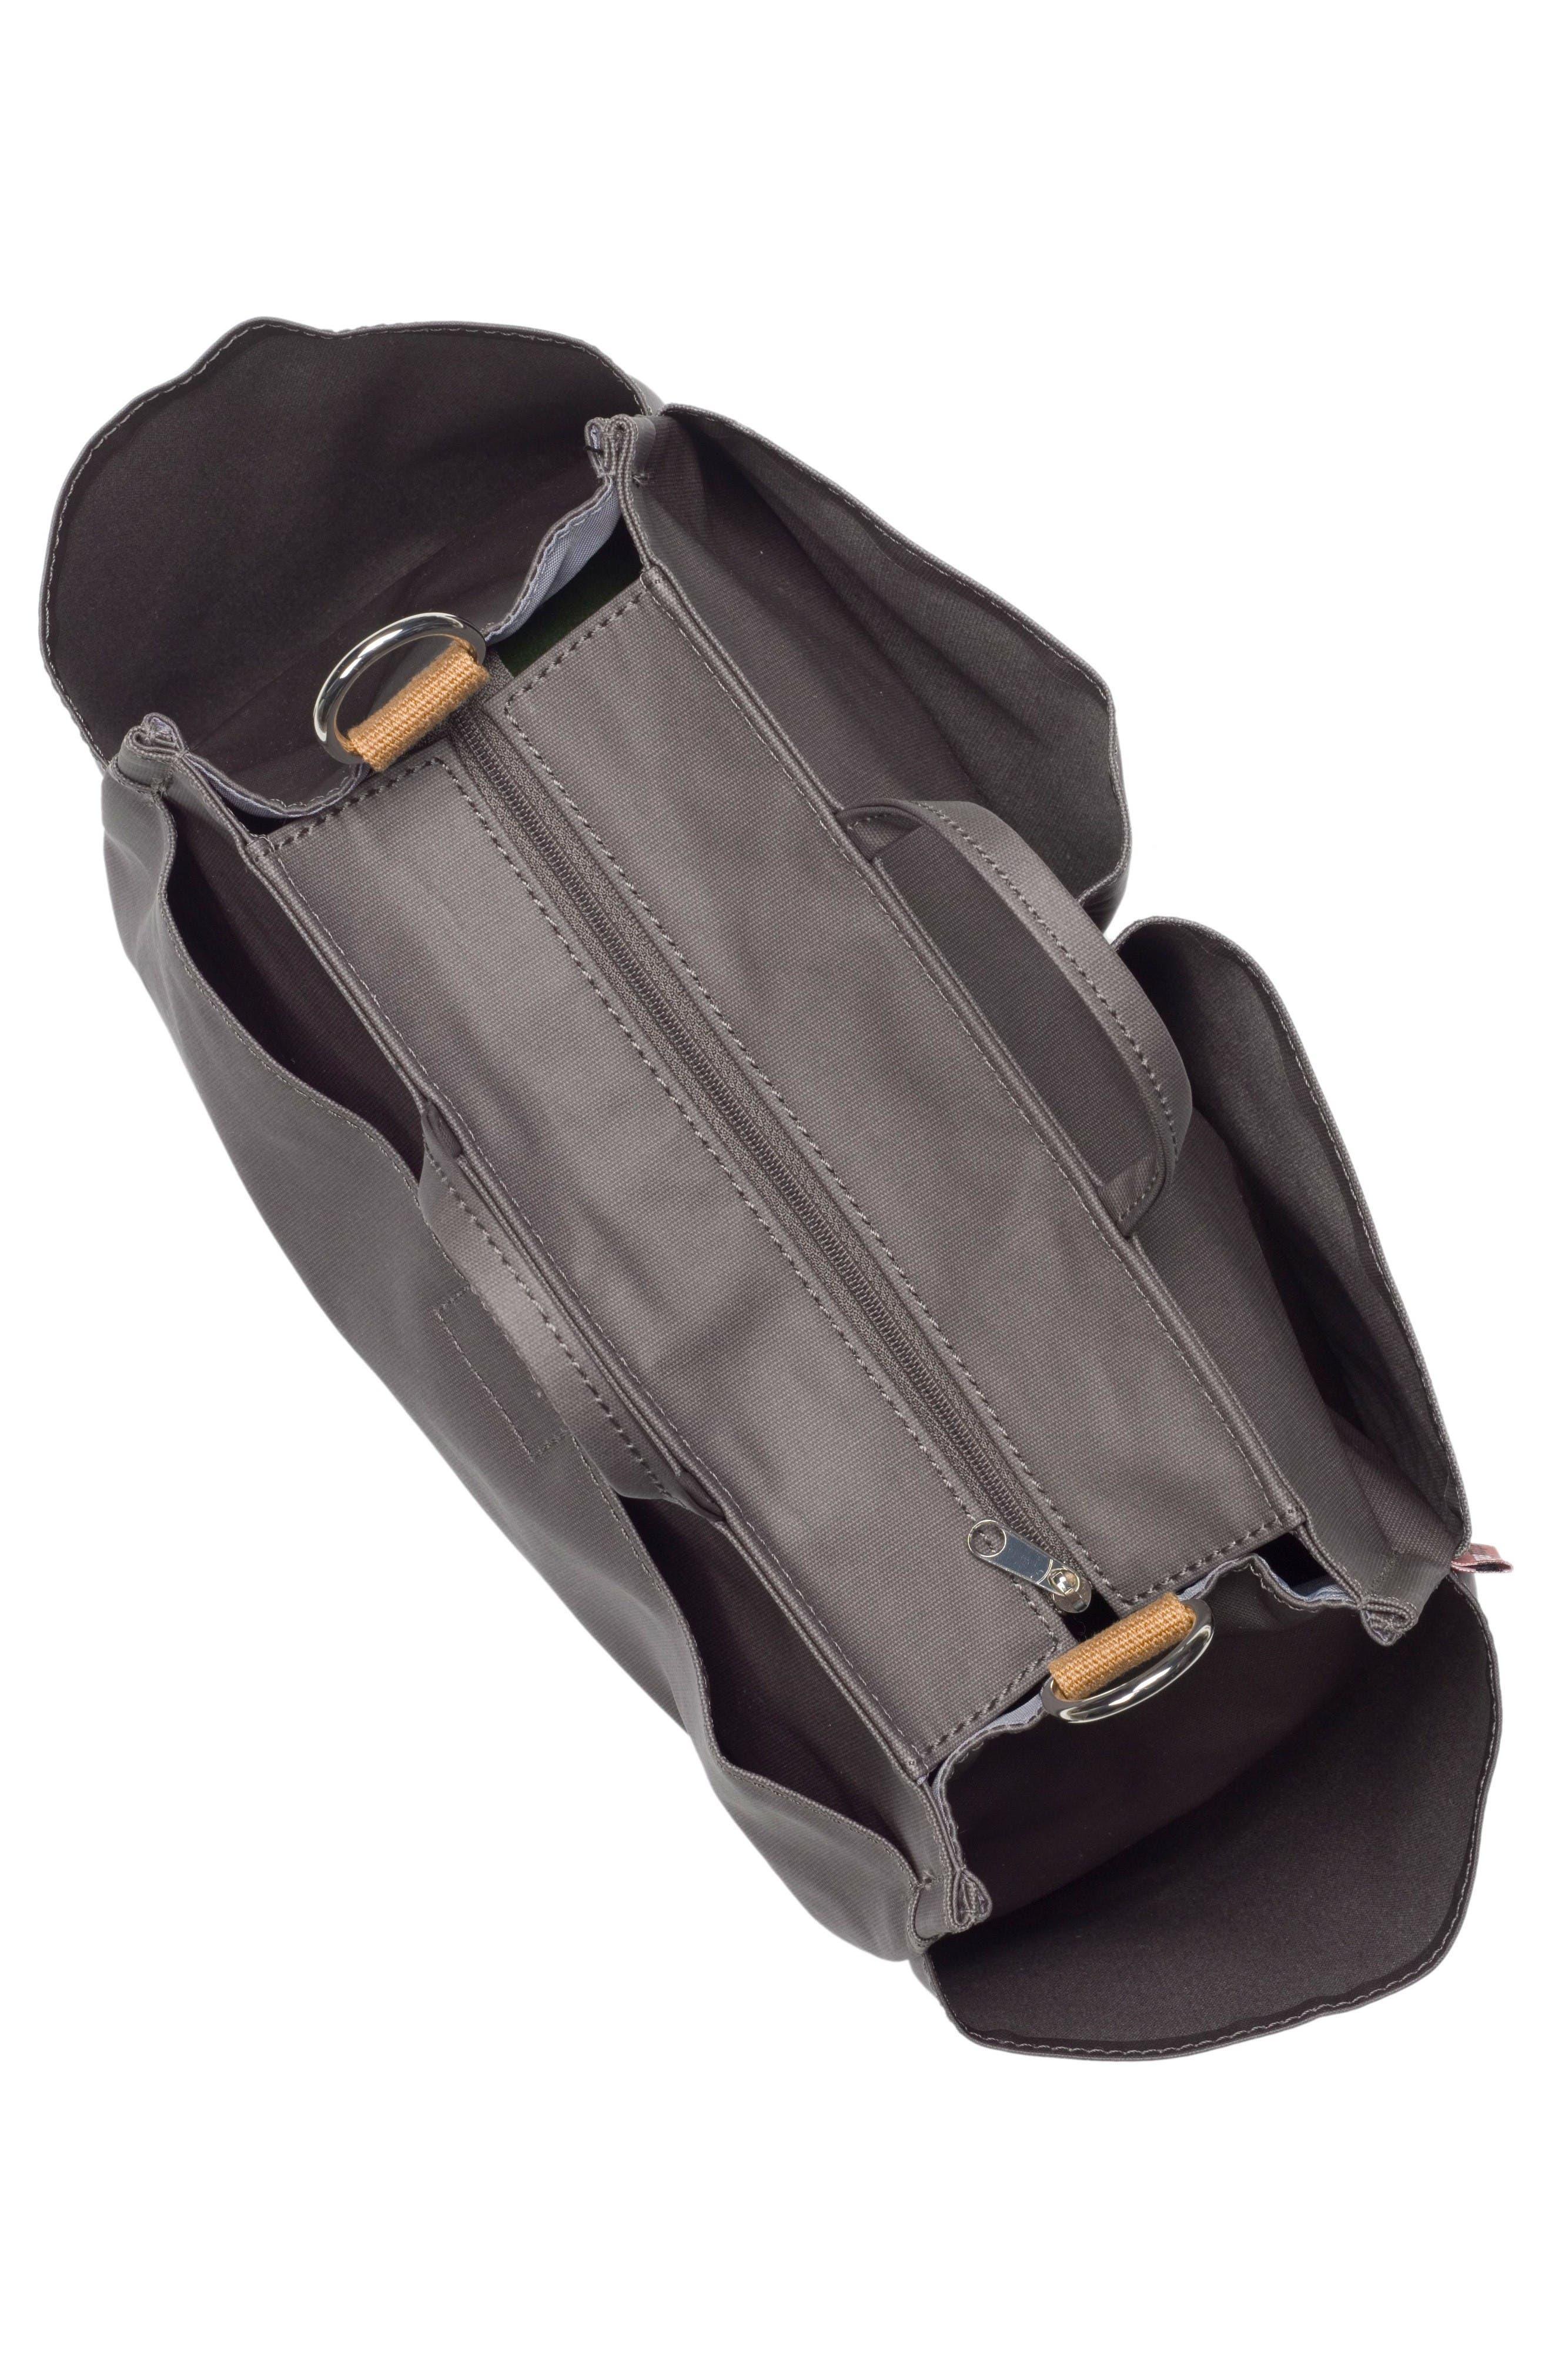 Noa Diaper Bag,                             Alternate thumbnail 5, color,                             Grey